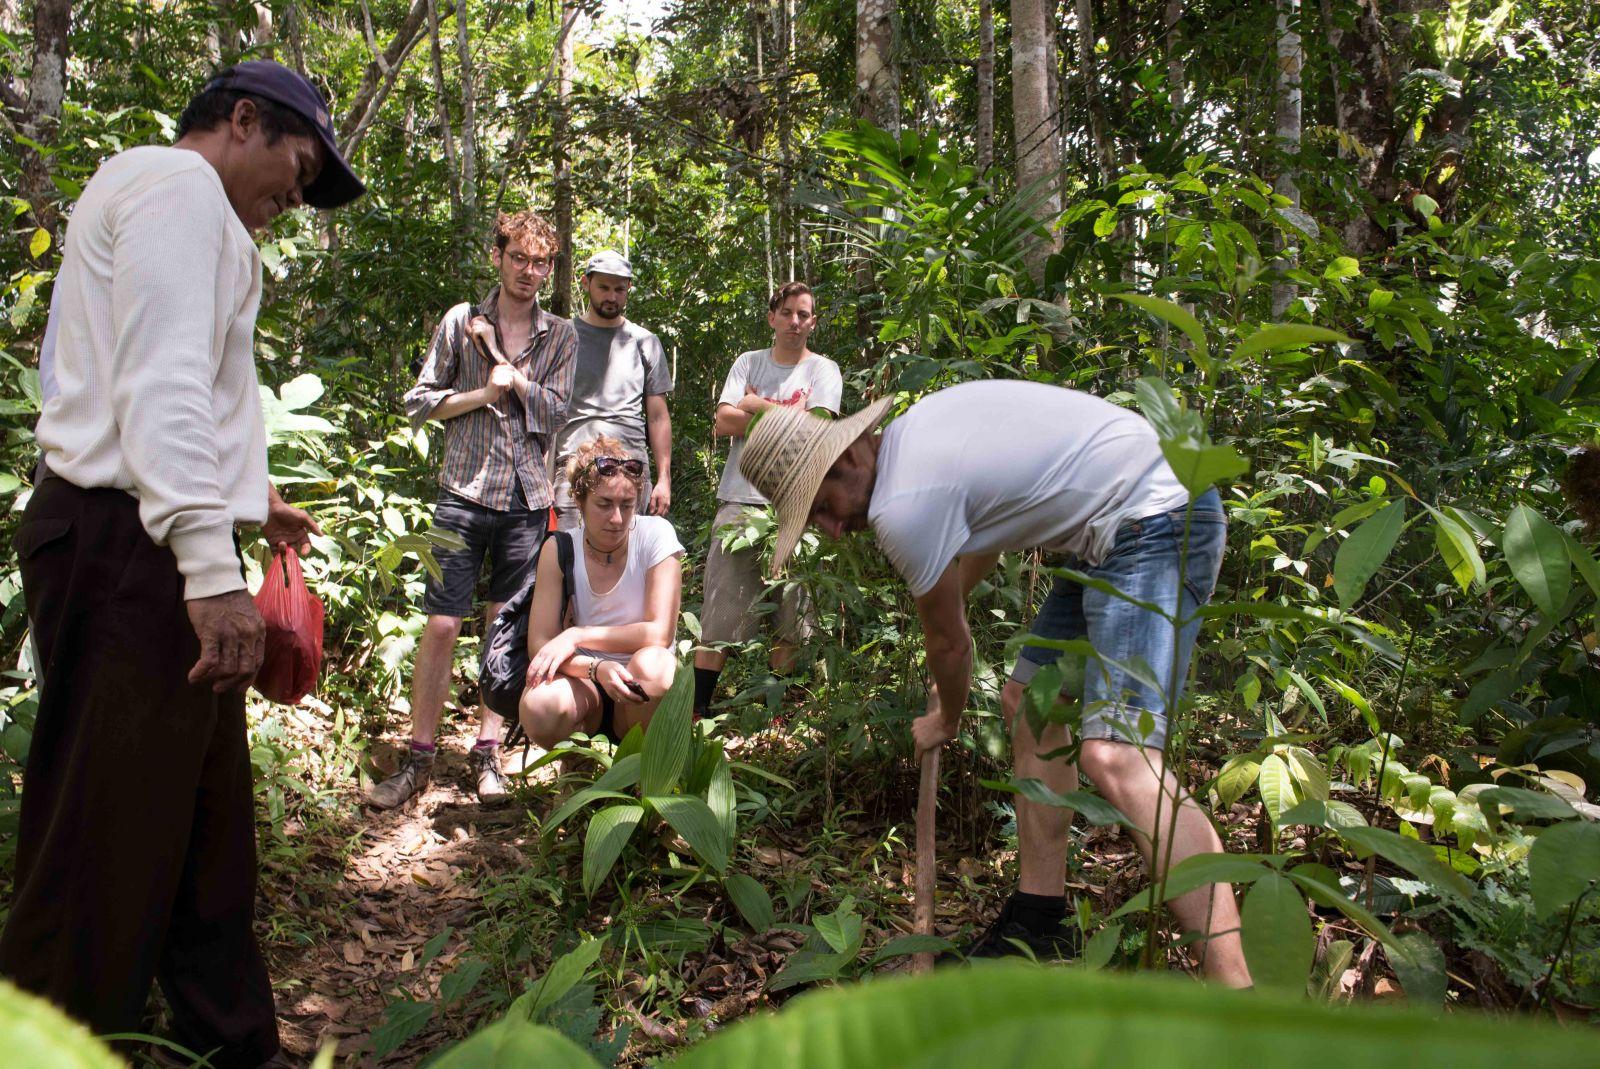 The Ecosia team visits the Gunug Lastarai reforestation project partners in Borneo, Indonesia - pho…